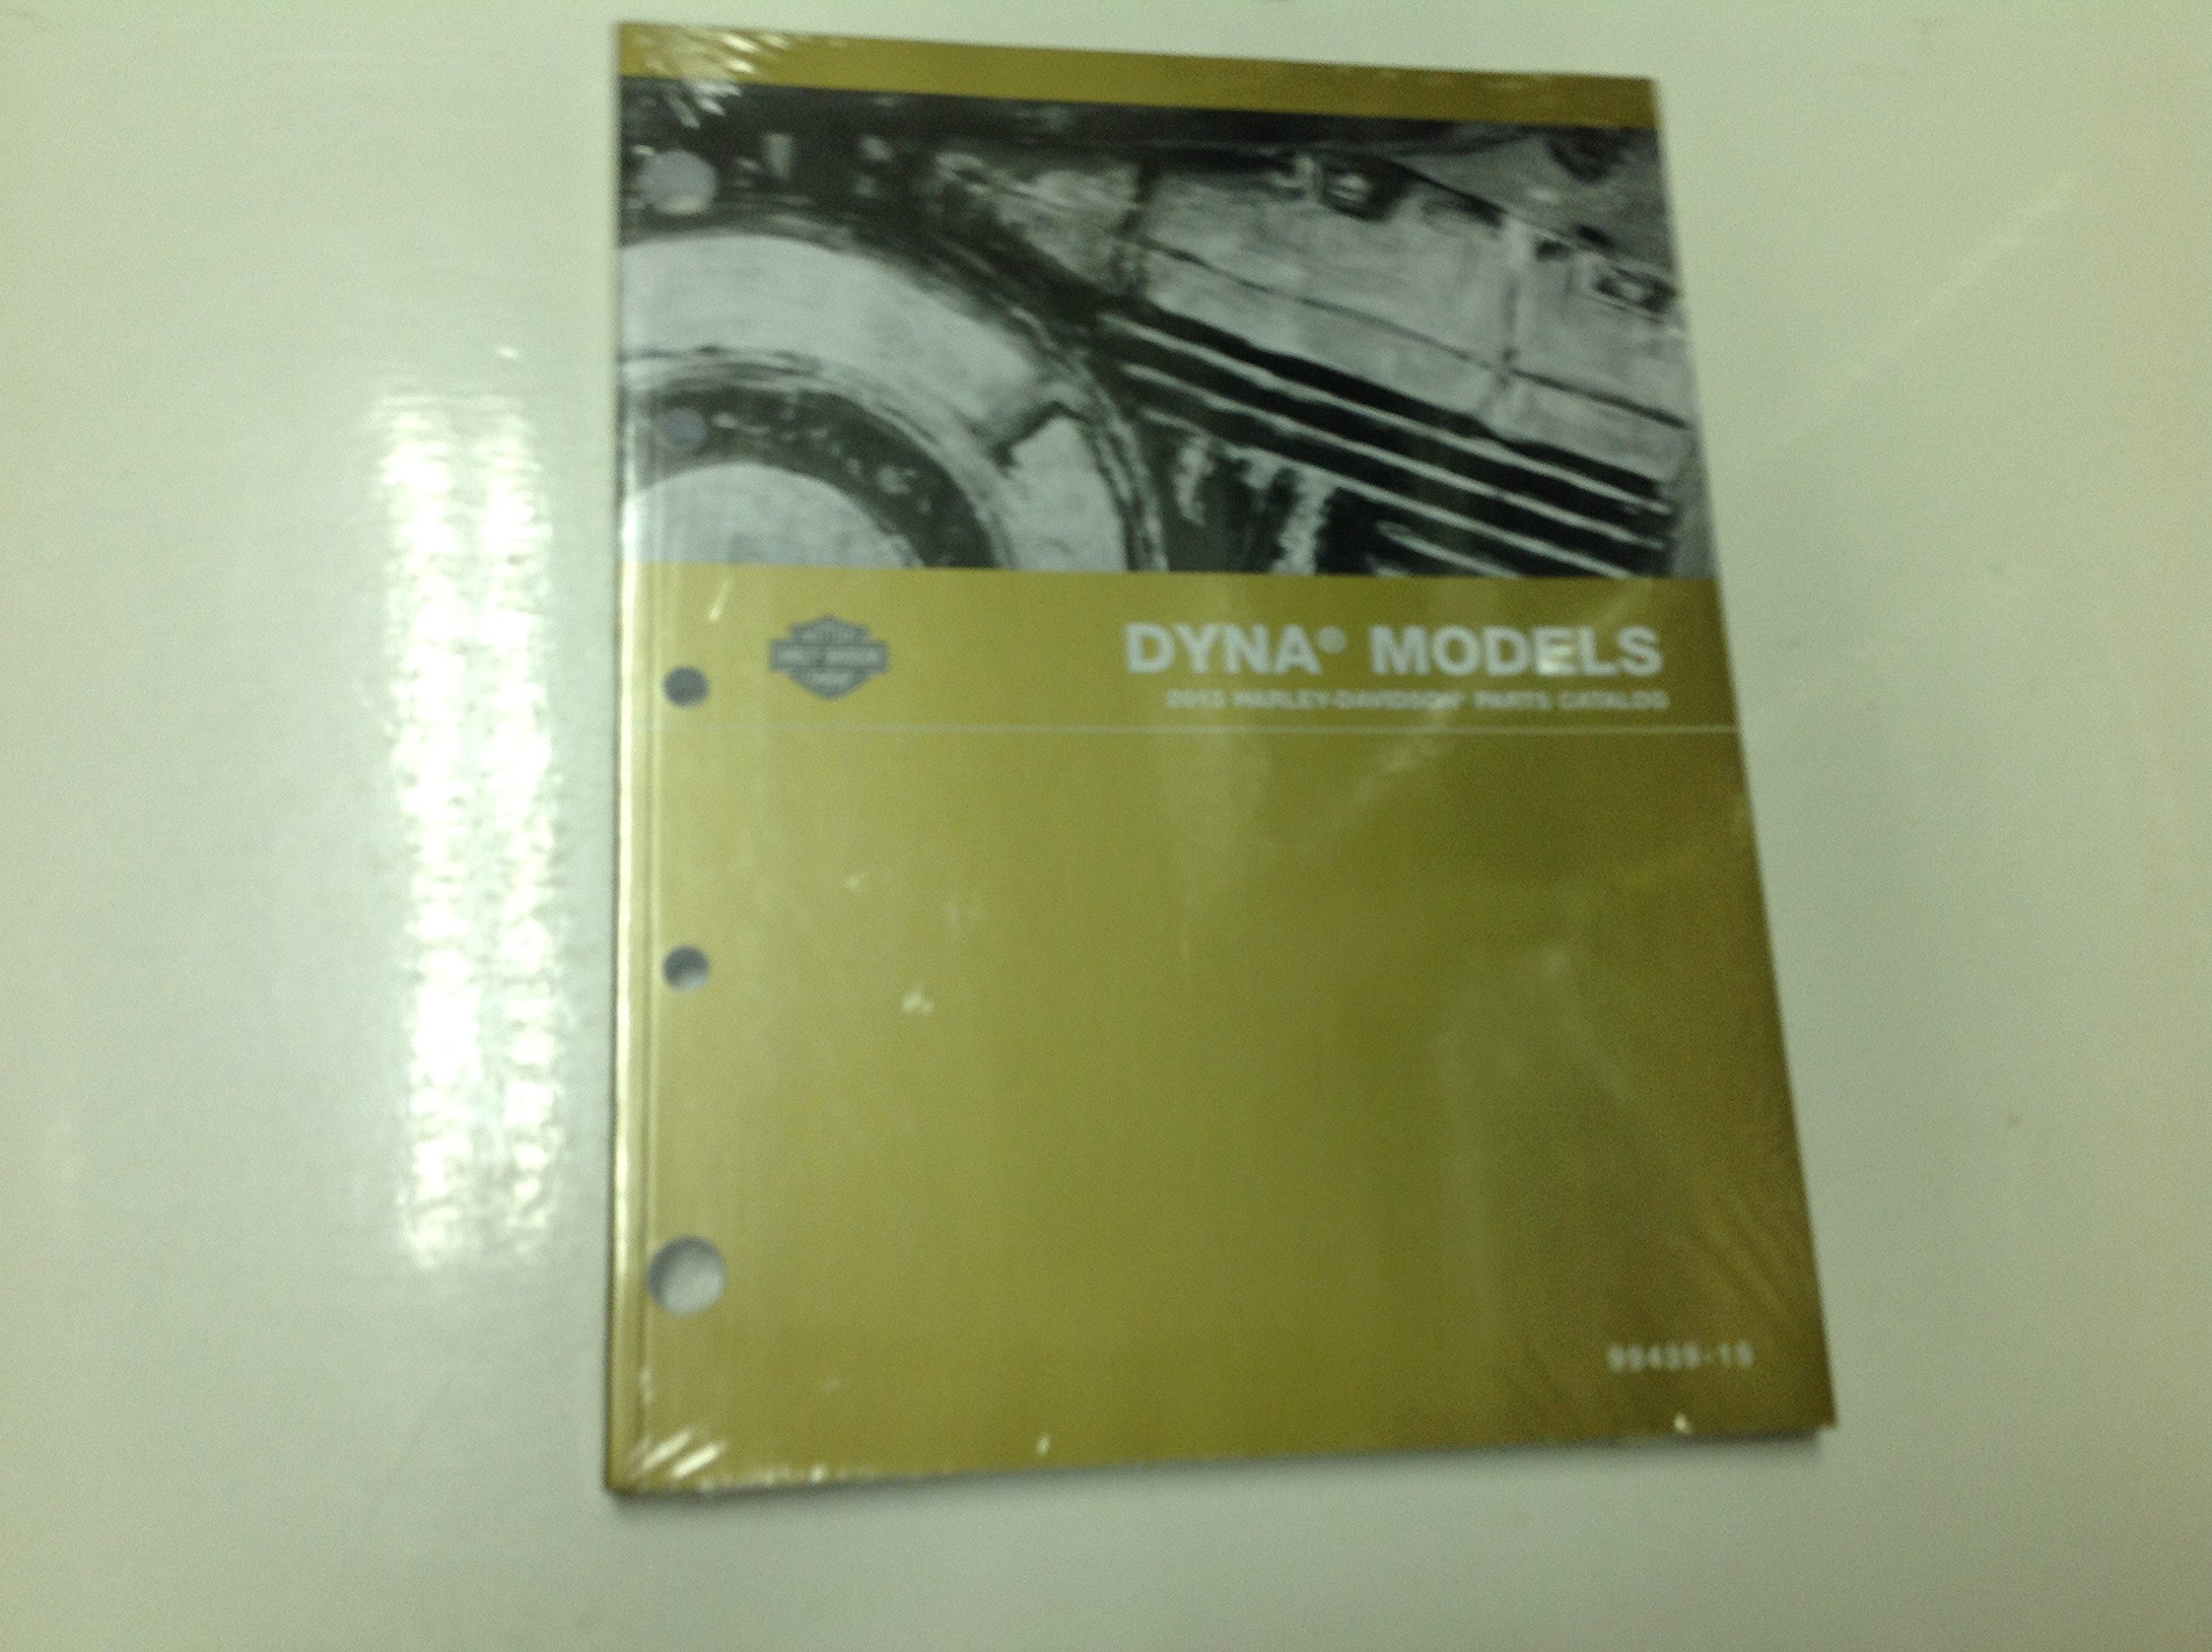 2015 Harley Davidson Street Models Parts Catalog Manual Book Brand New 2015 ebook